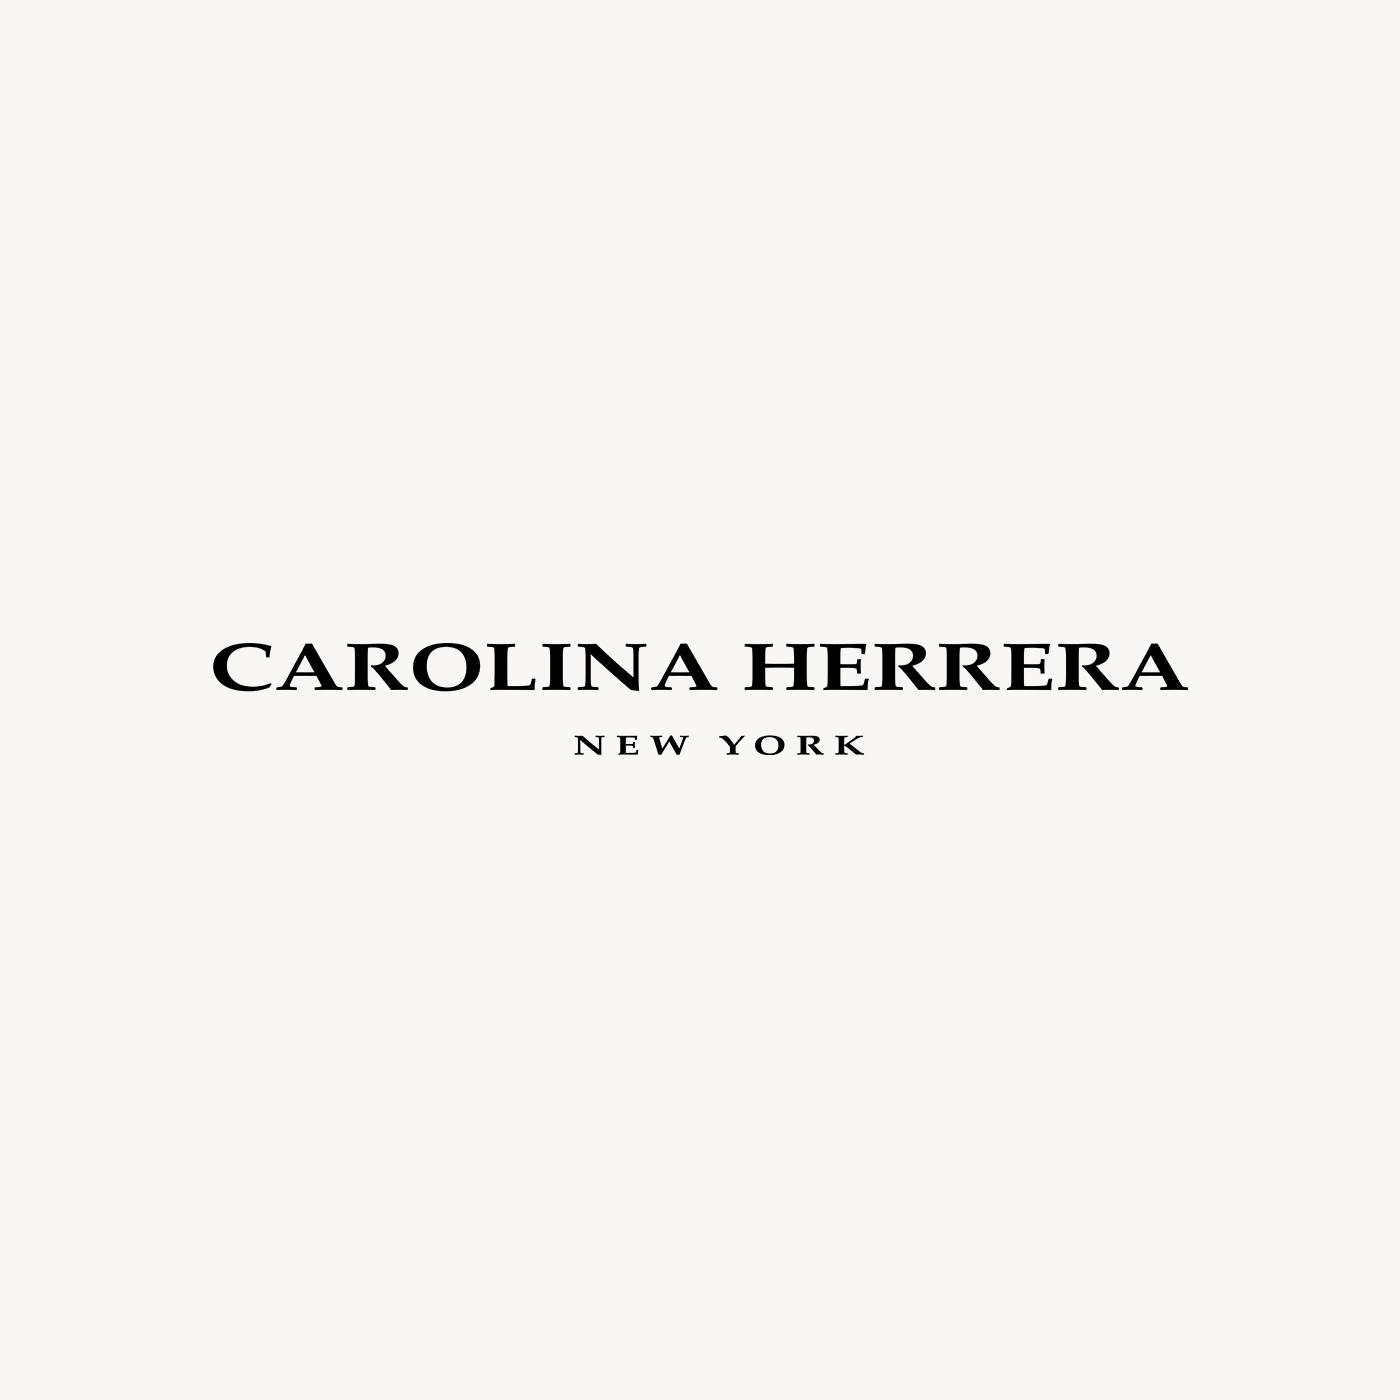 Carolia Herrera Logo.jpg